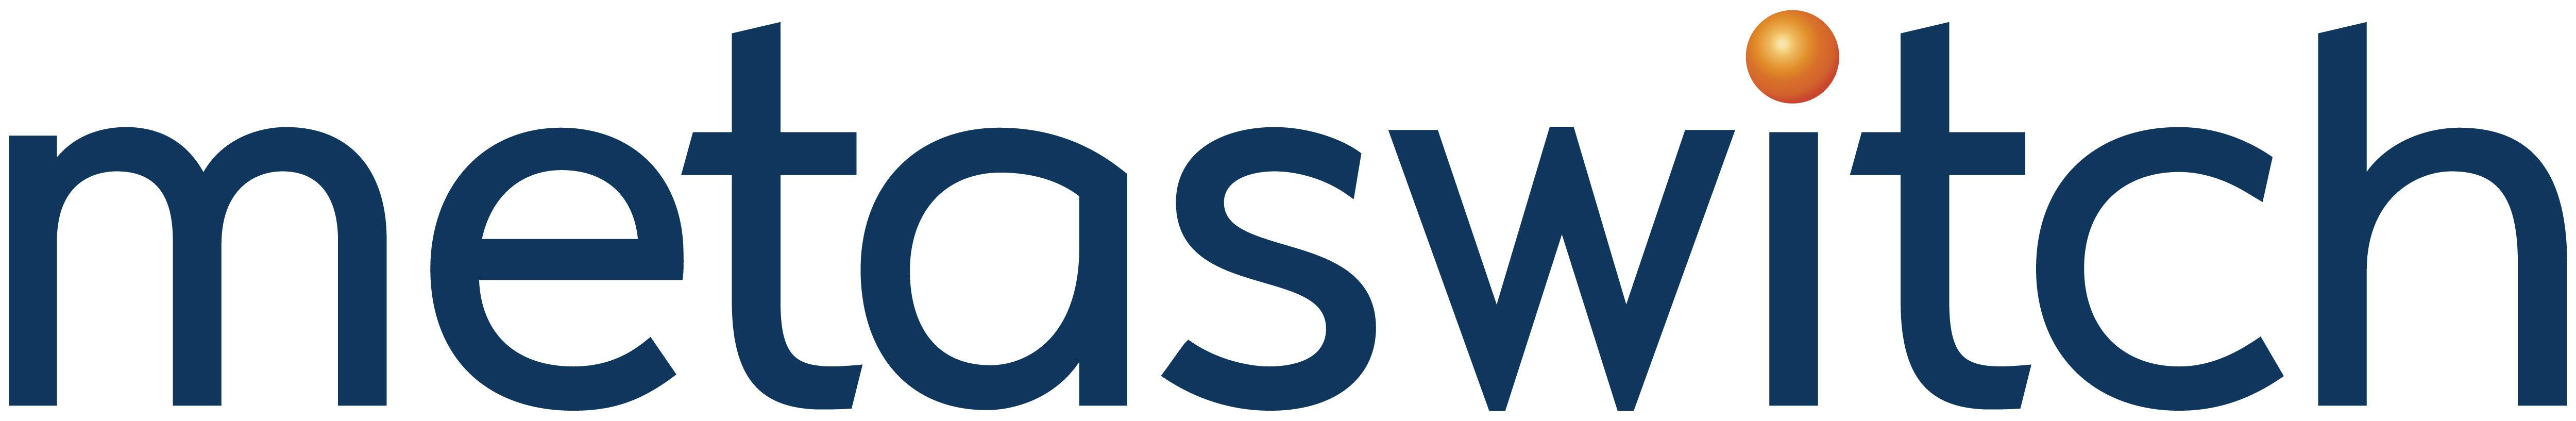 Metaswitch Logo (1)